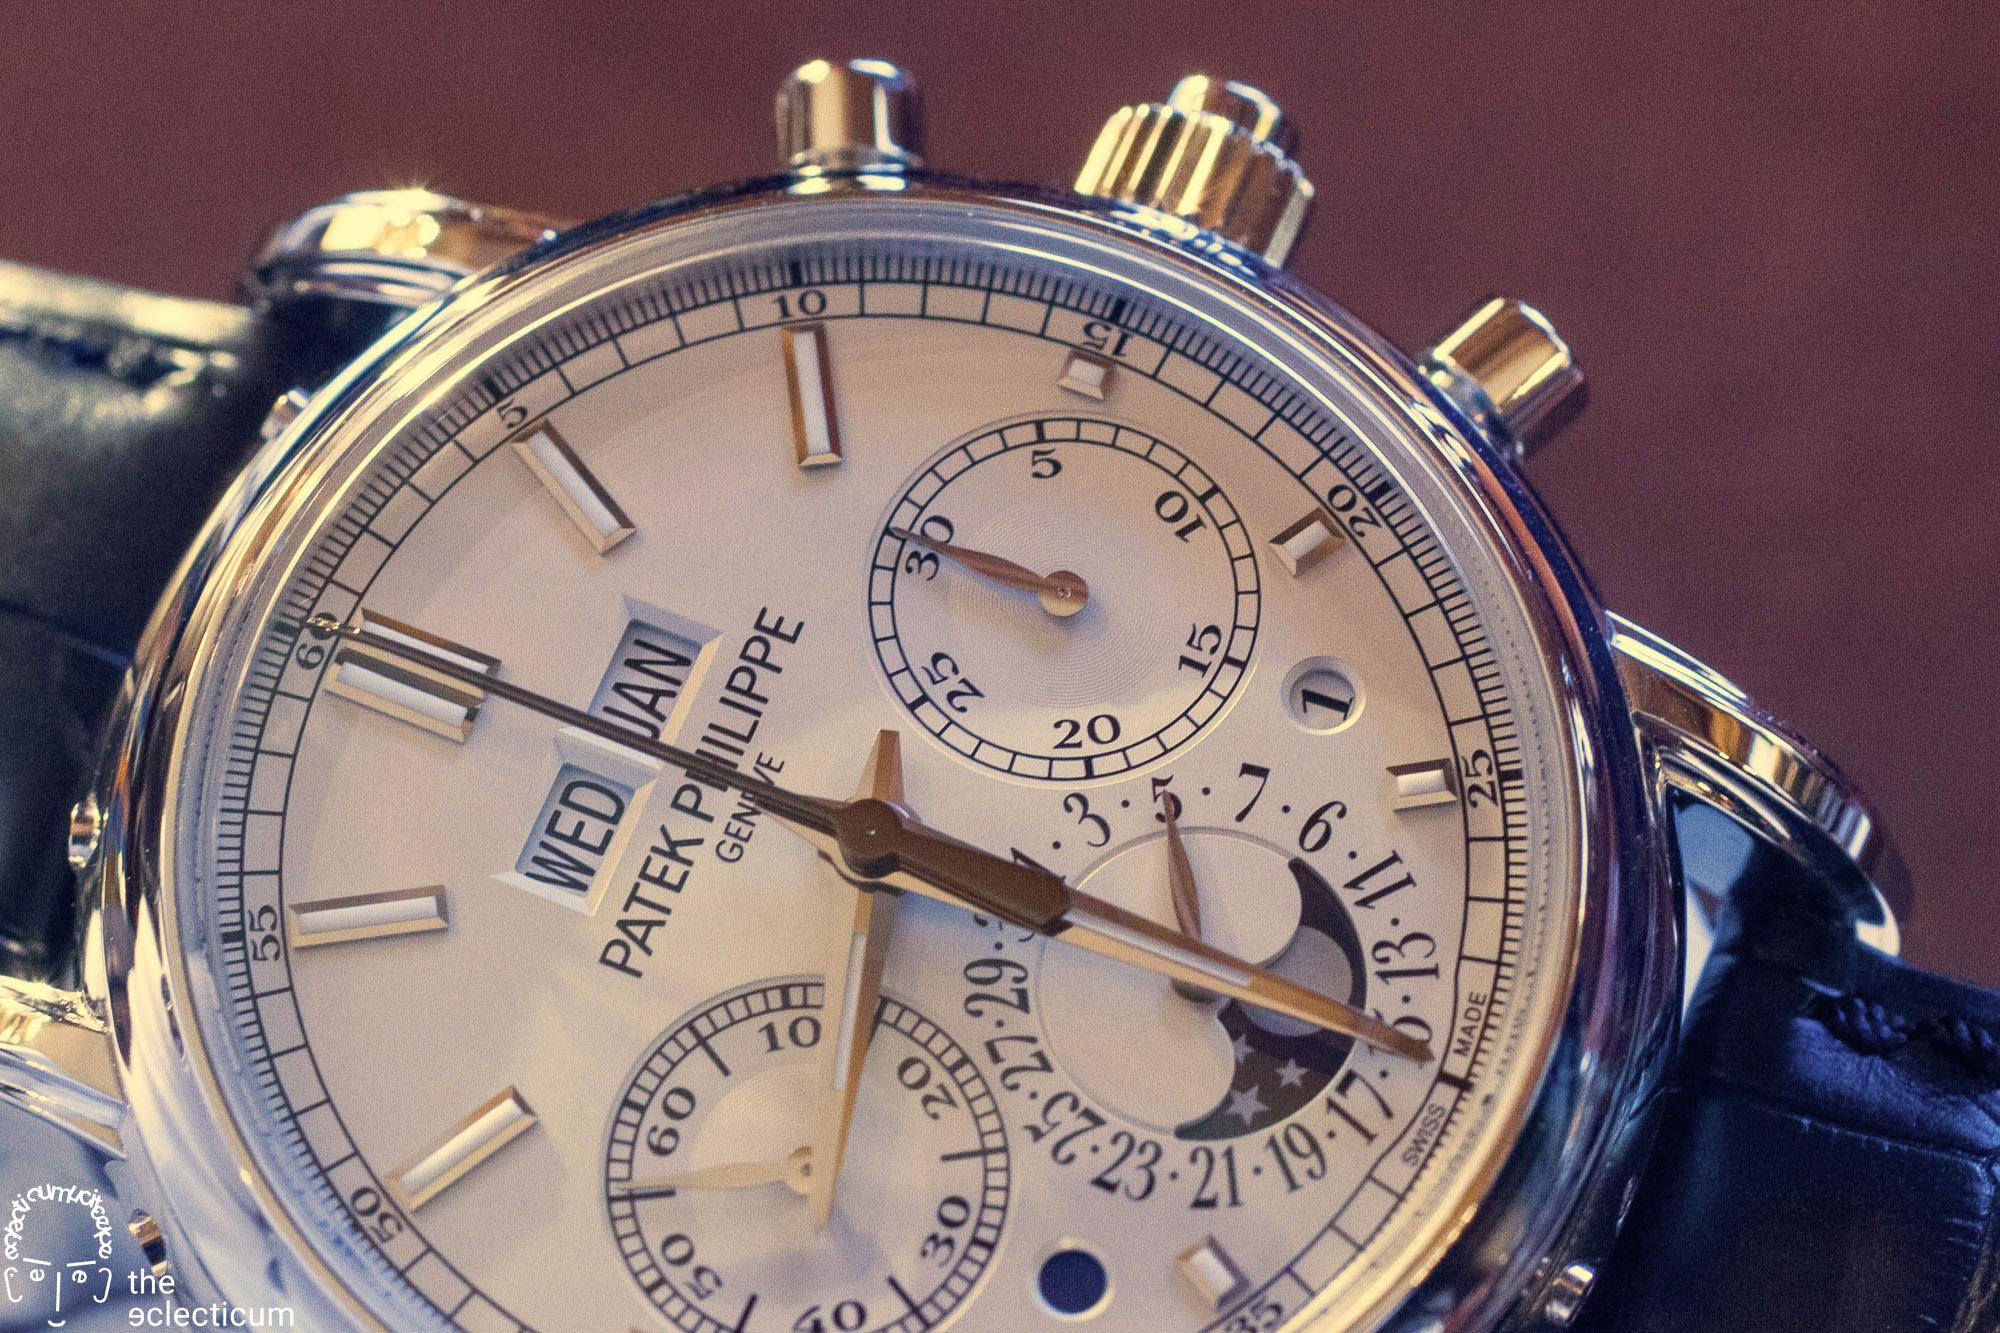 Patek Philippe 5204P rattrapante split-seconds chronograph perpetual calendar